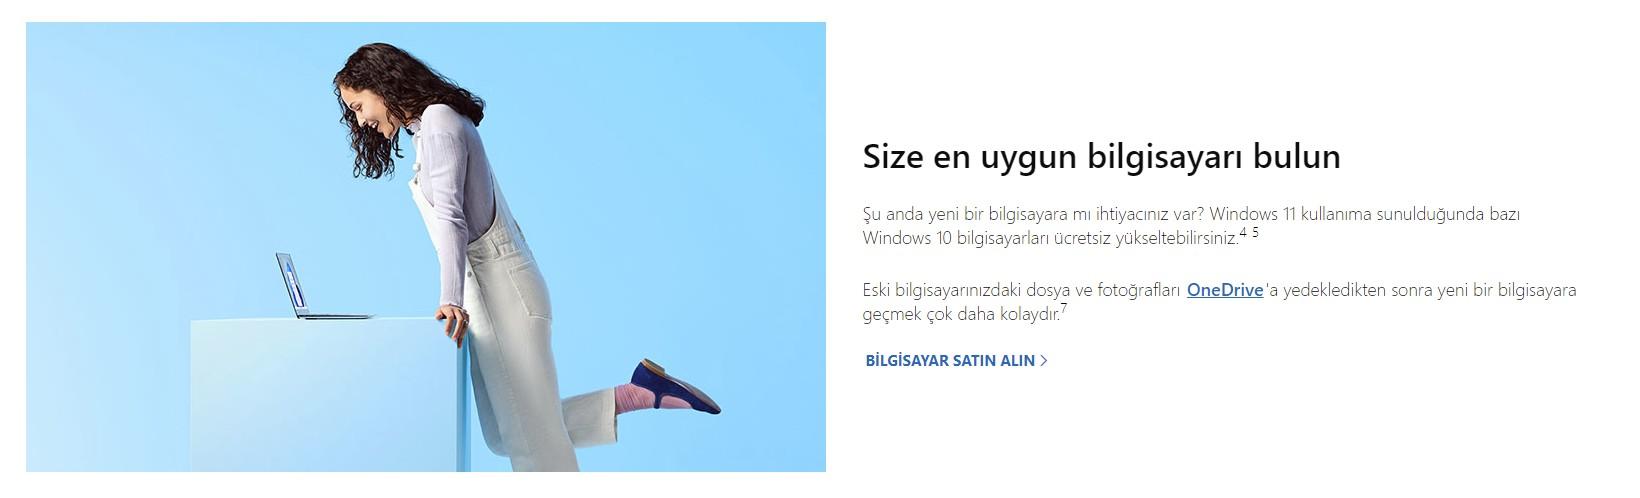 windows 11 ücretsiz